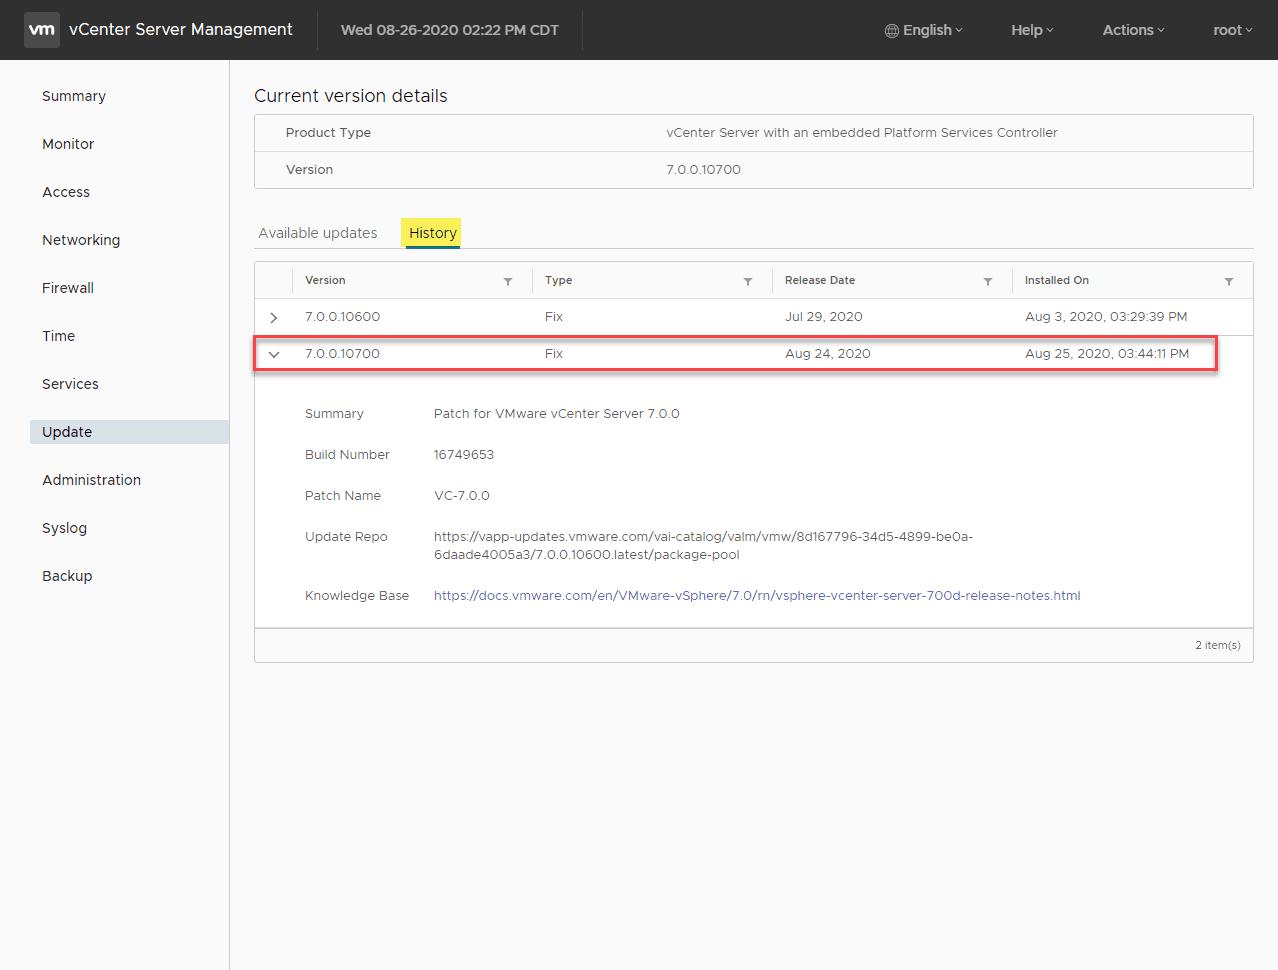 After-installing-the-vCenter-Server-7.0.0d-patch